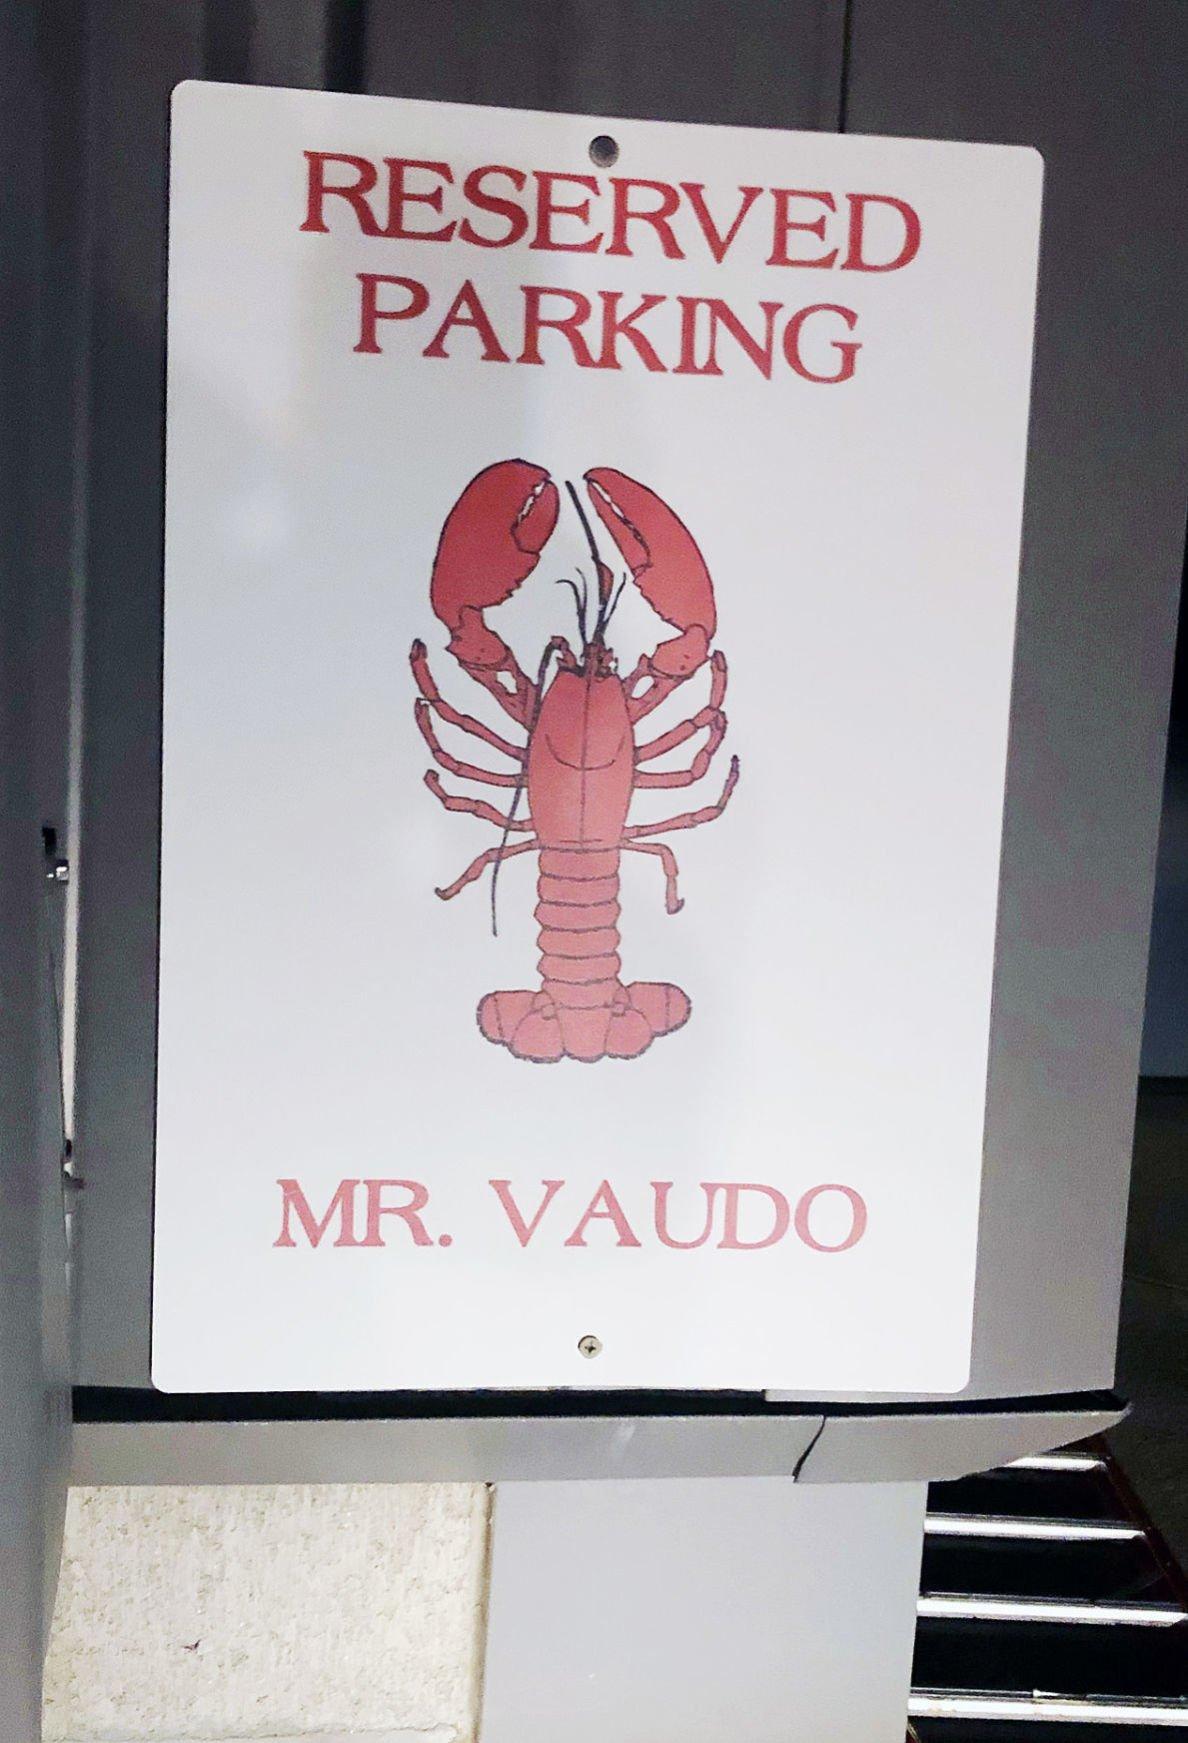 Joe Vaudo's Parking Space